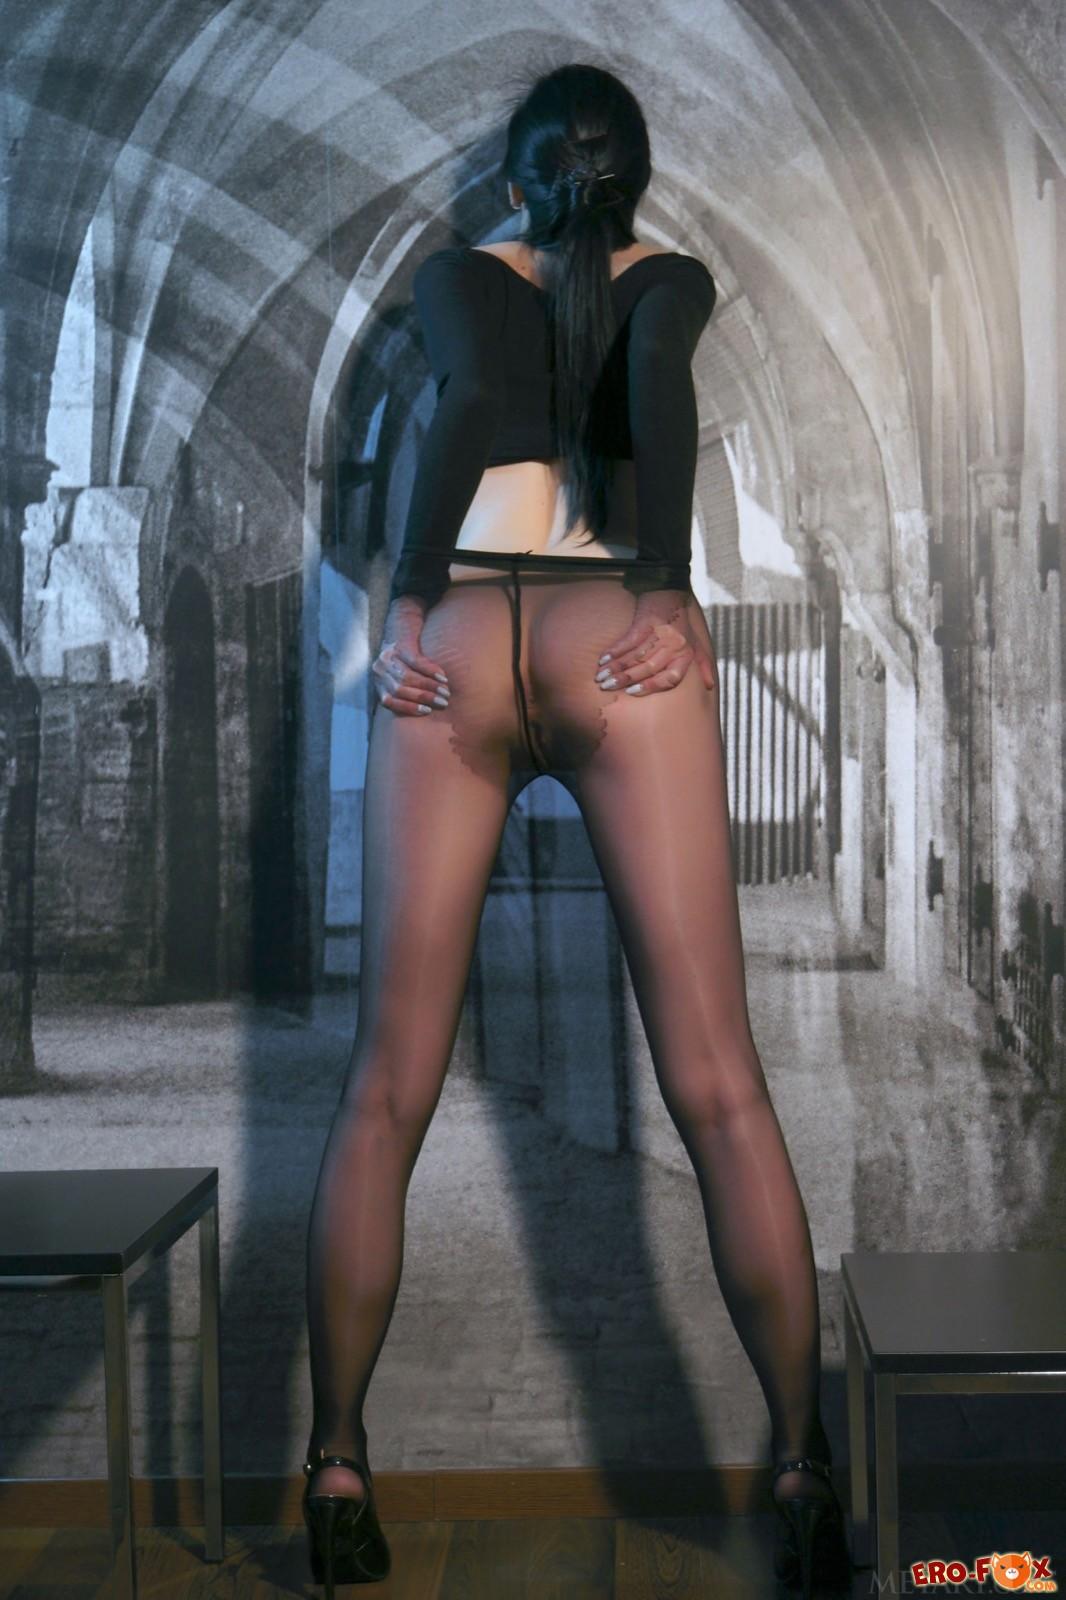 Девушка в колготках без трусов показала бритую киску